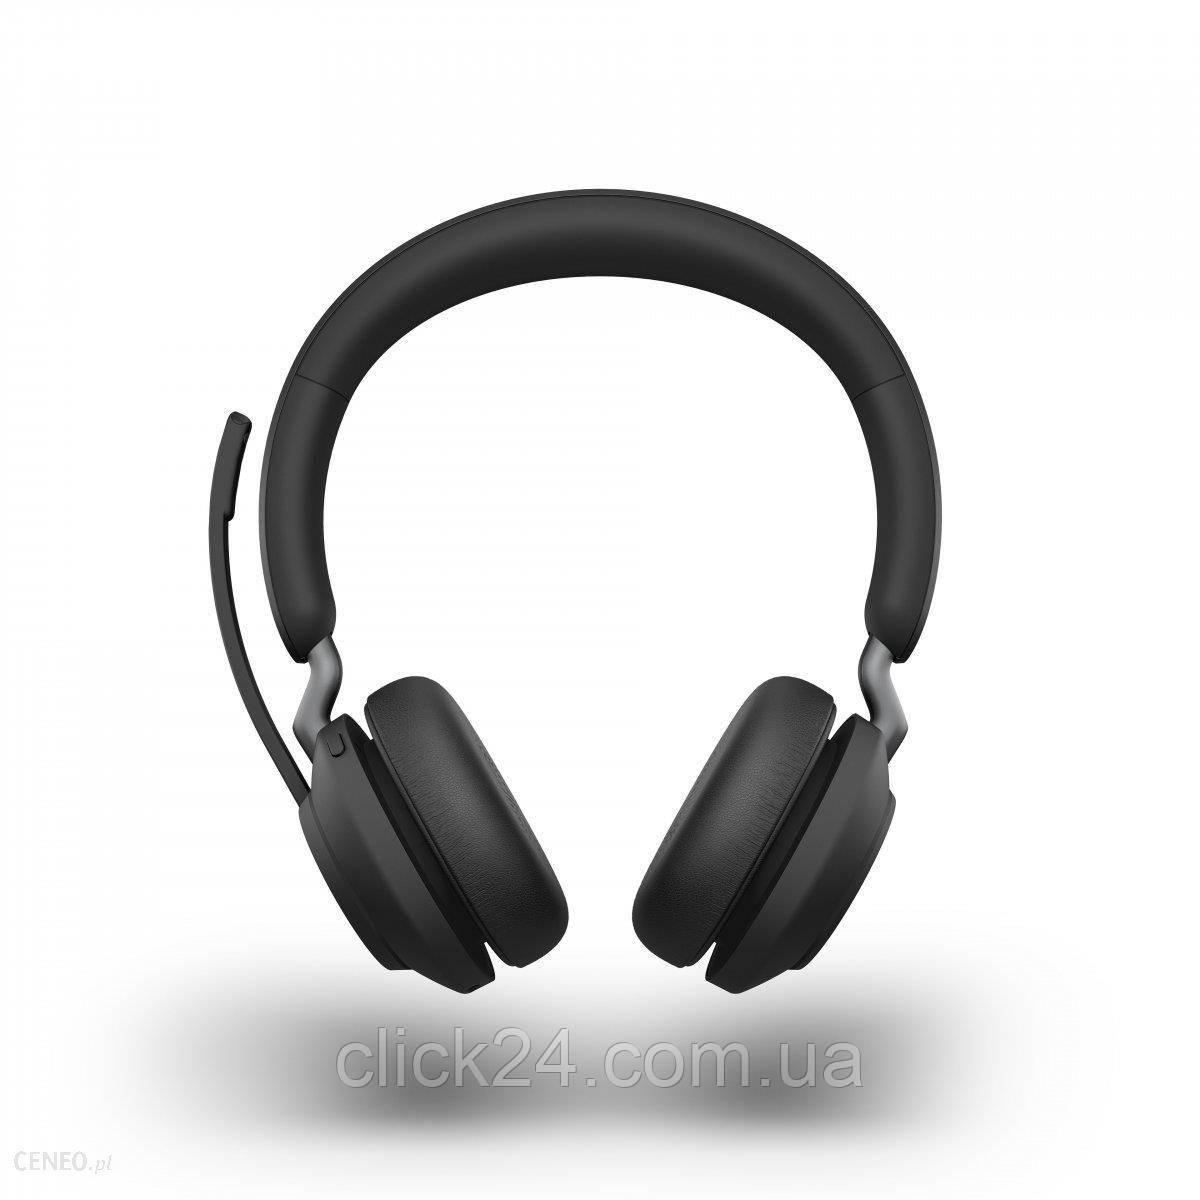 Jabra Evolve 2 65 UC Stereo, Black